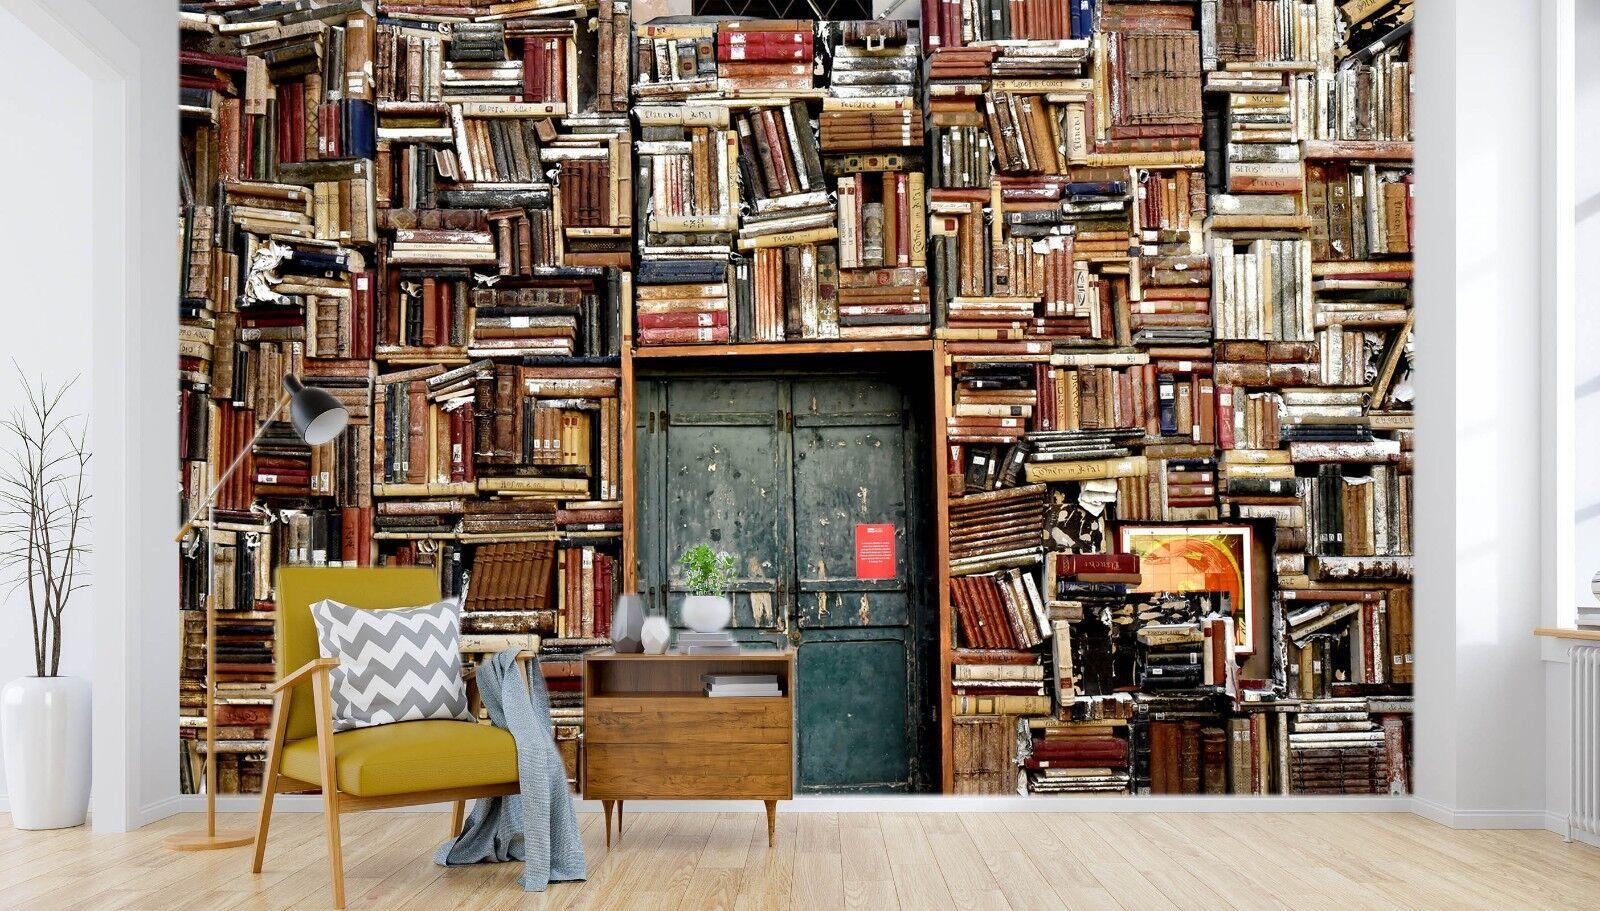 3D Bookshelf Door 76 Wallpaper Mural Paper Wall Print Murals UK Jenny